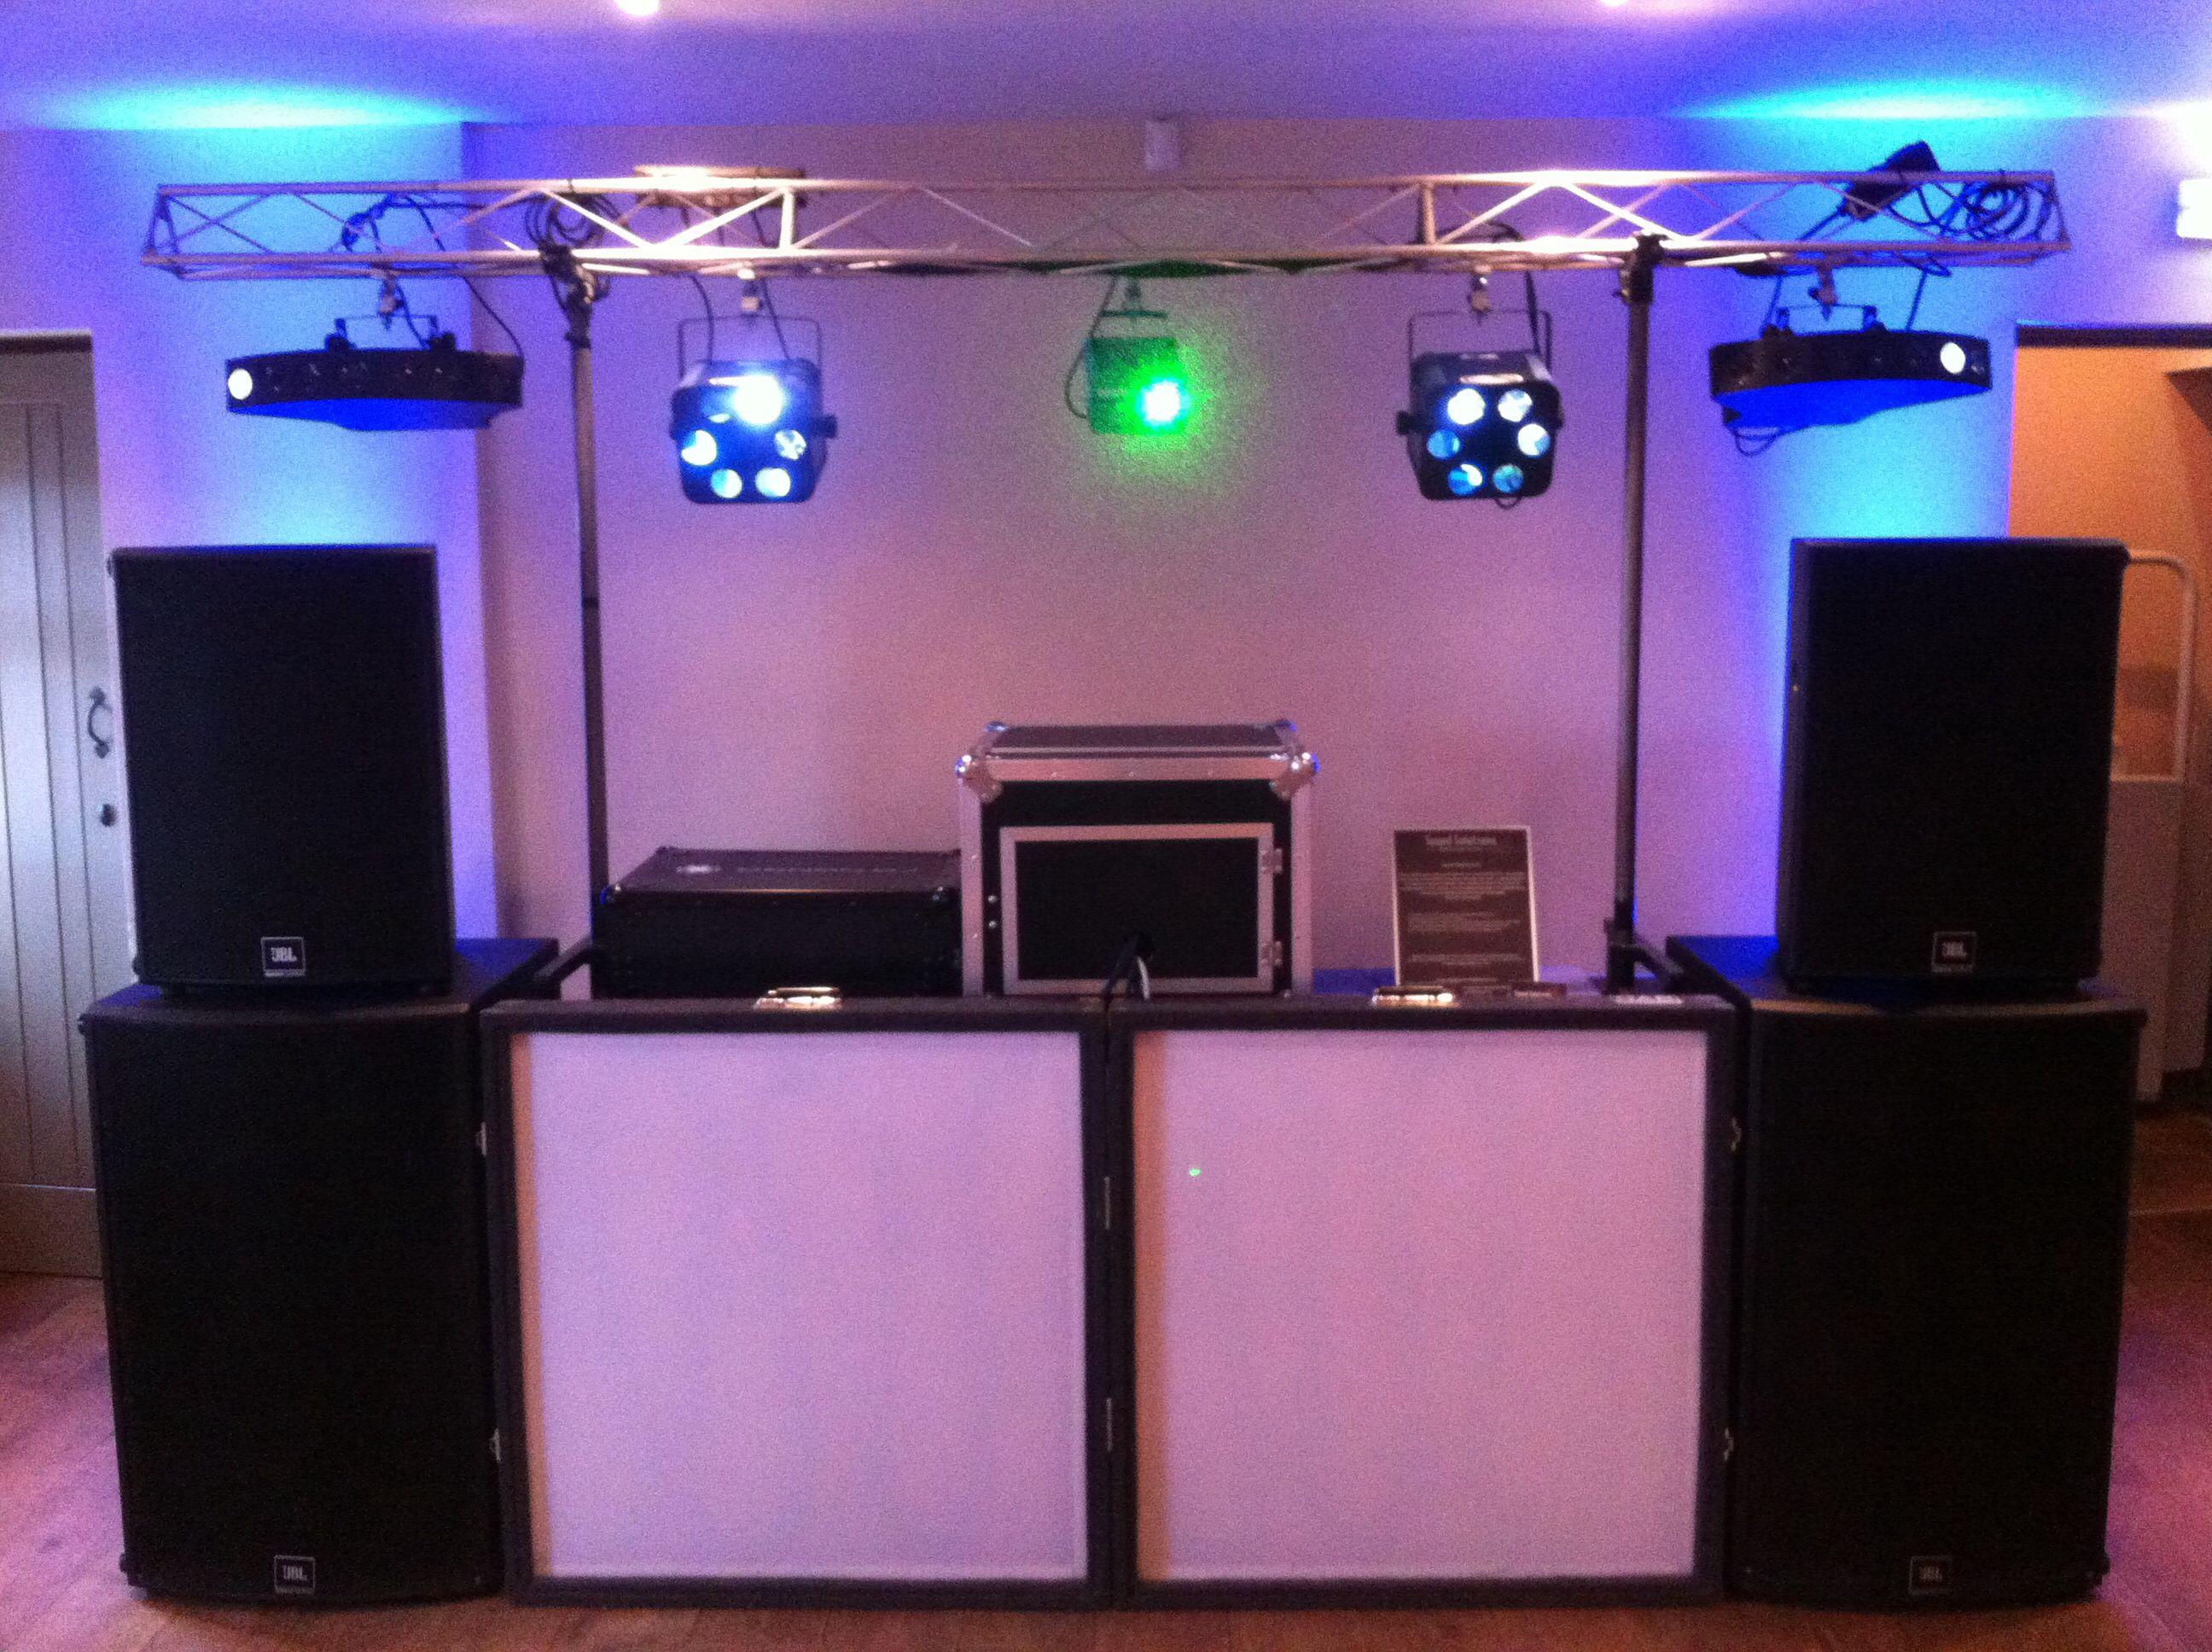 Wedding Dj Setup Dj setup, Wedding dj setup, Wedding dj